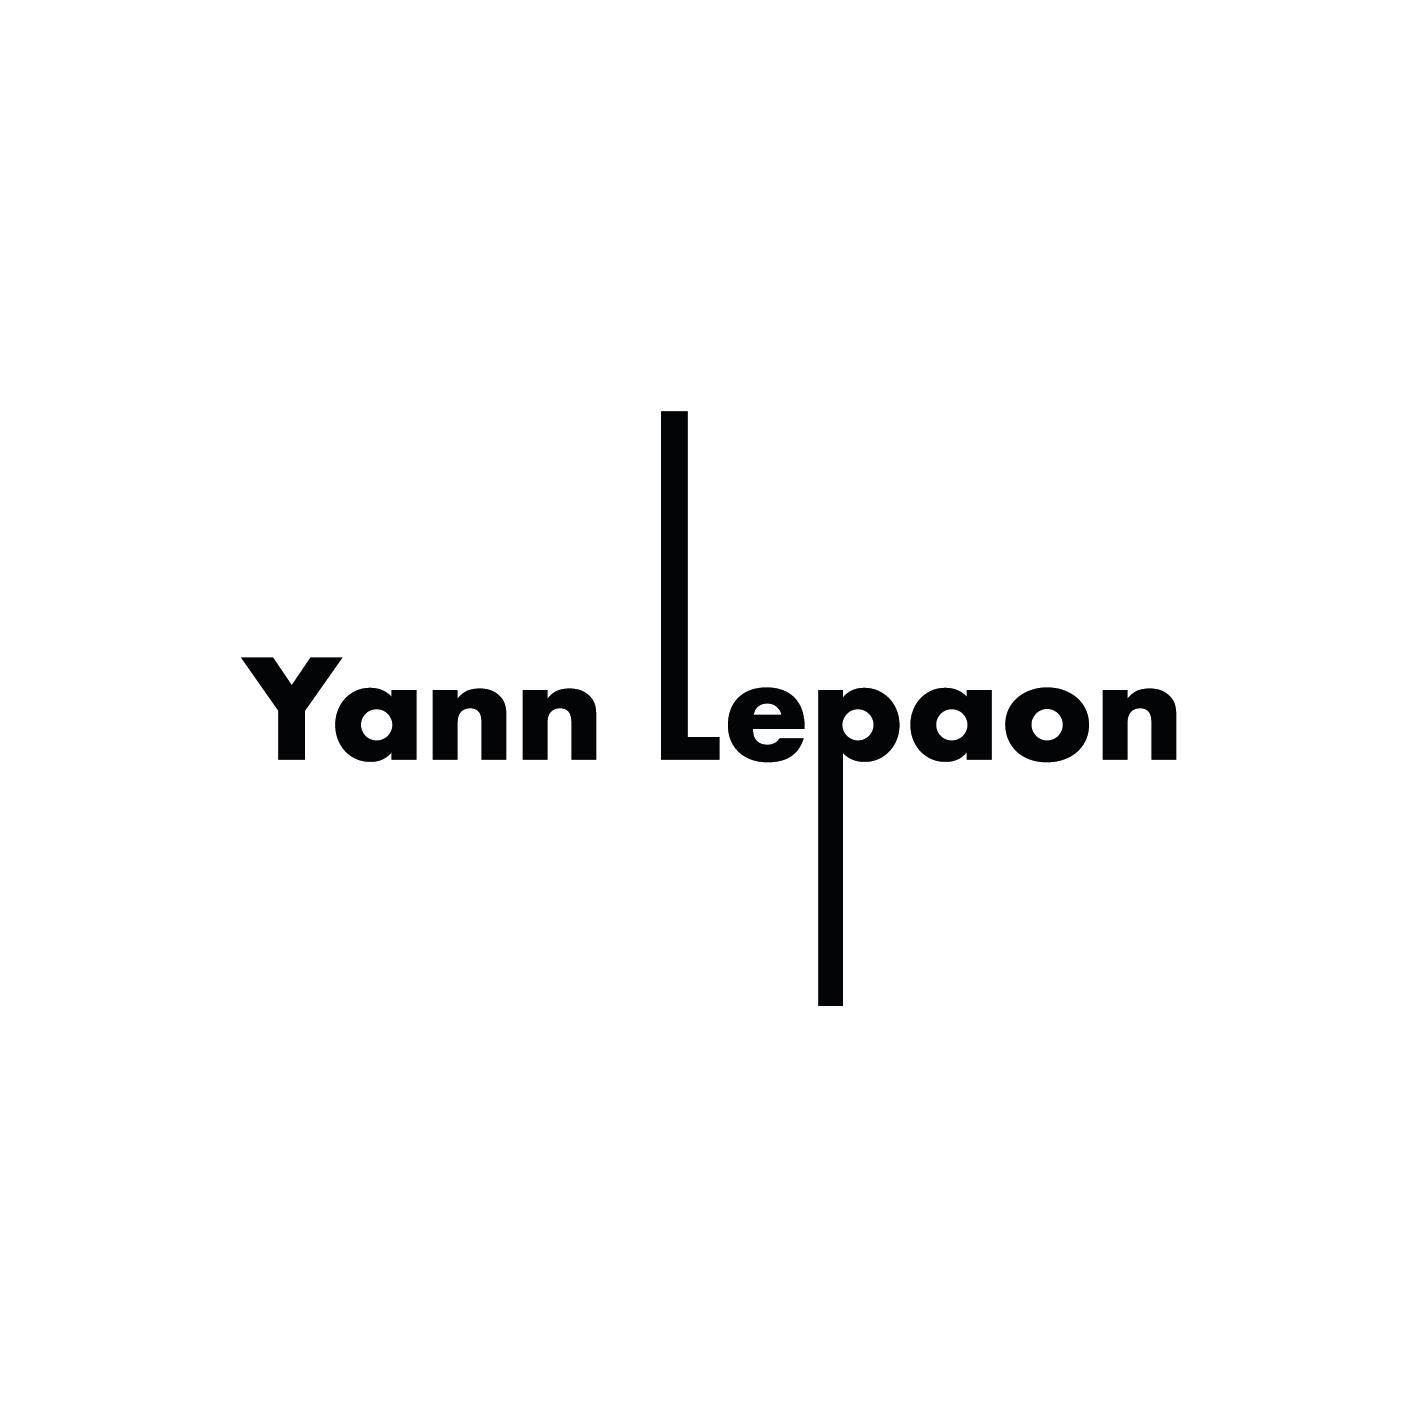 yann lepaonPlan de travail 1.png